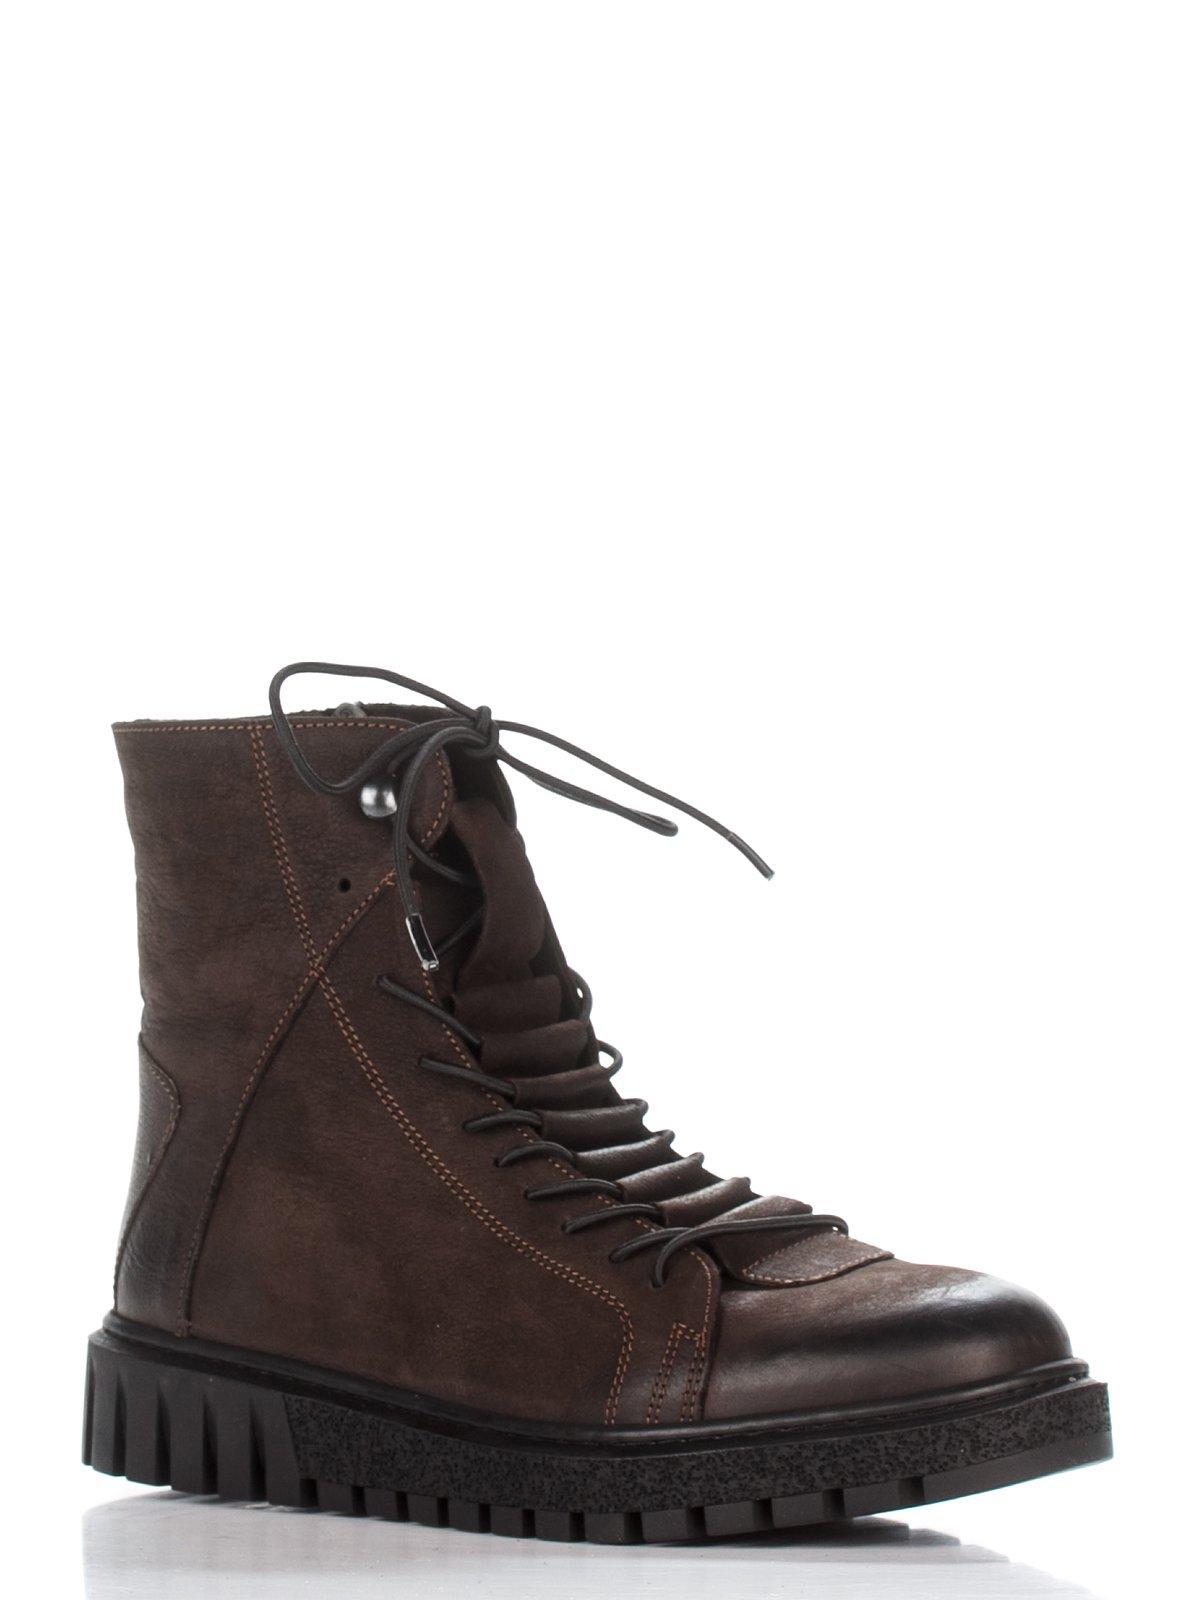 Ботинки коричневые   2742747